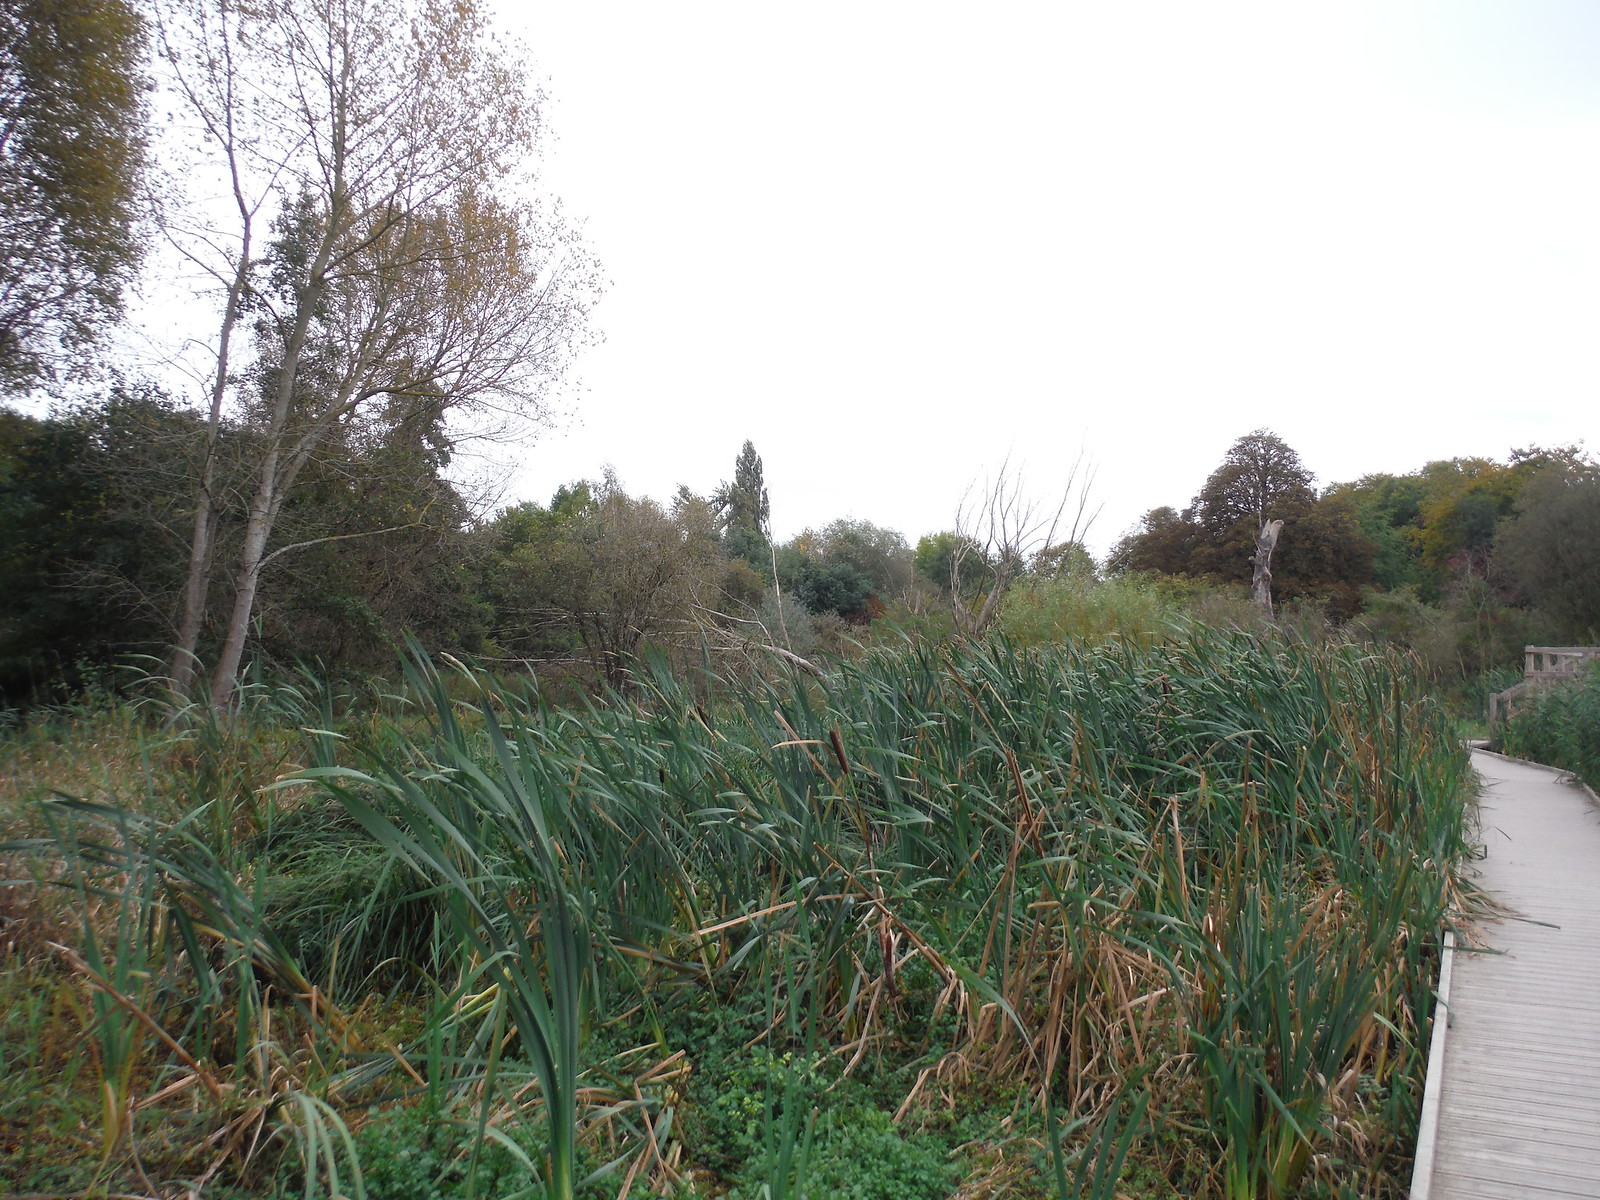 Boardwalk through Wetlands, Morden Hall Park SWC Walk Short 13 - Morden Hall Park and Merton Abbey Mills